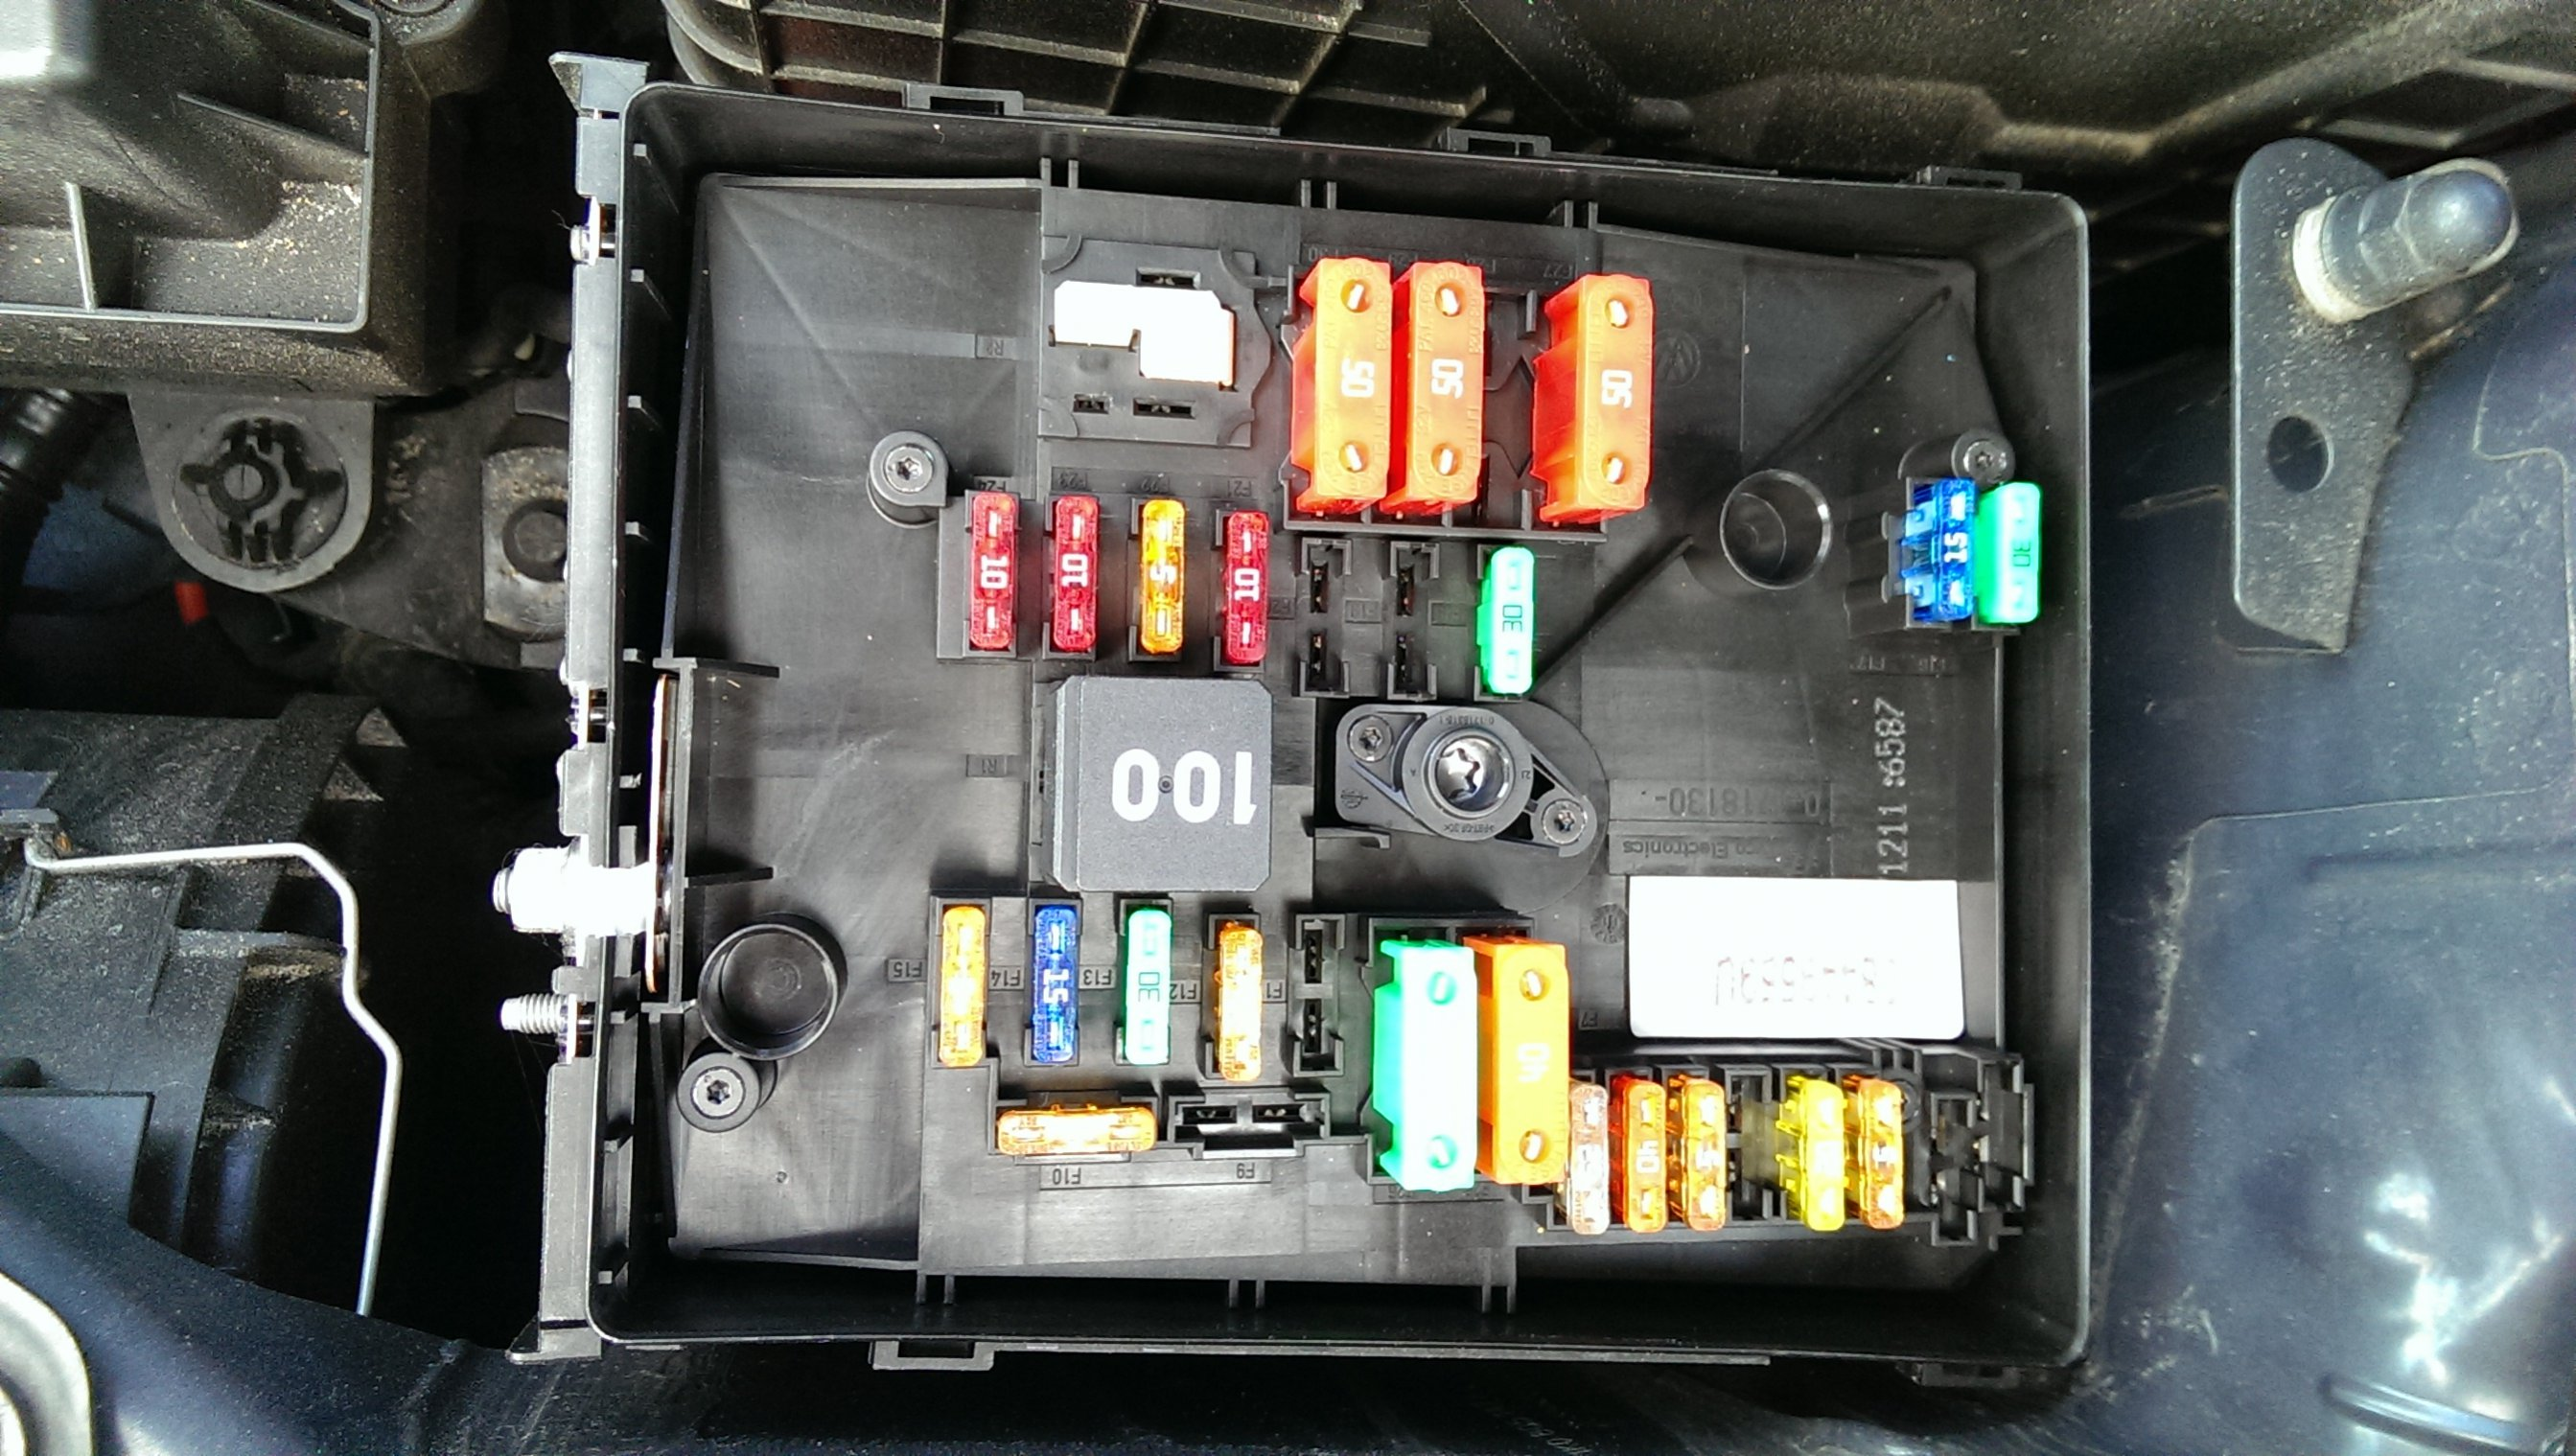 Vw Tiguan Fuse Box Manual Of Wiring Diagram 2011 2012 Volkswagen Hyundai Genesis 2015 2010 Location